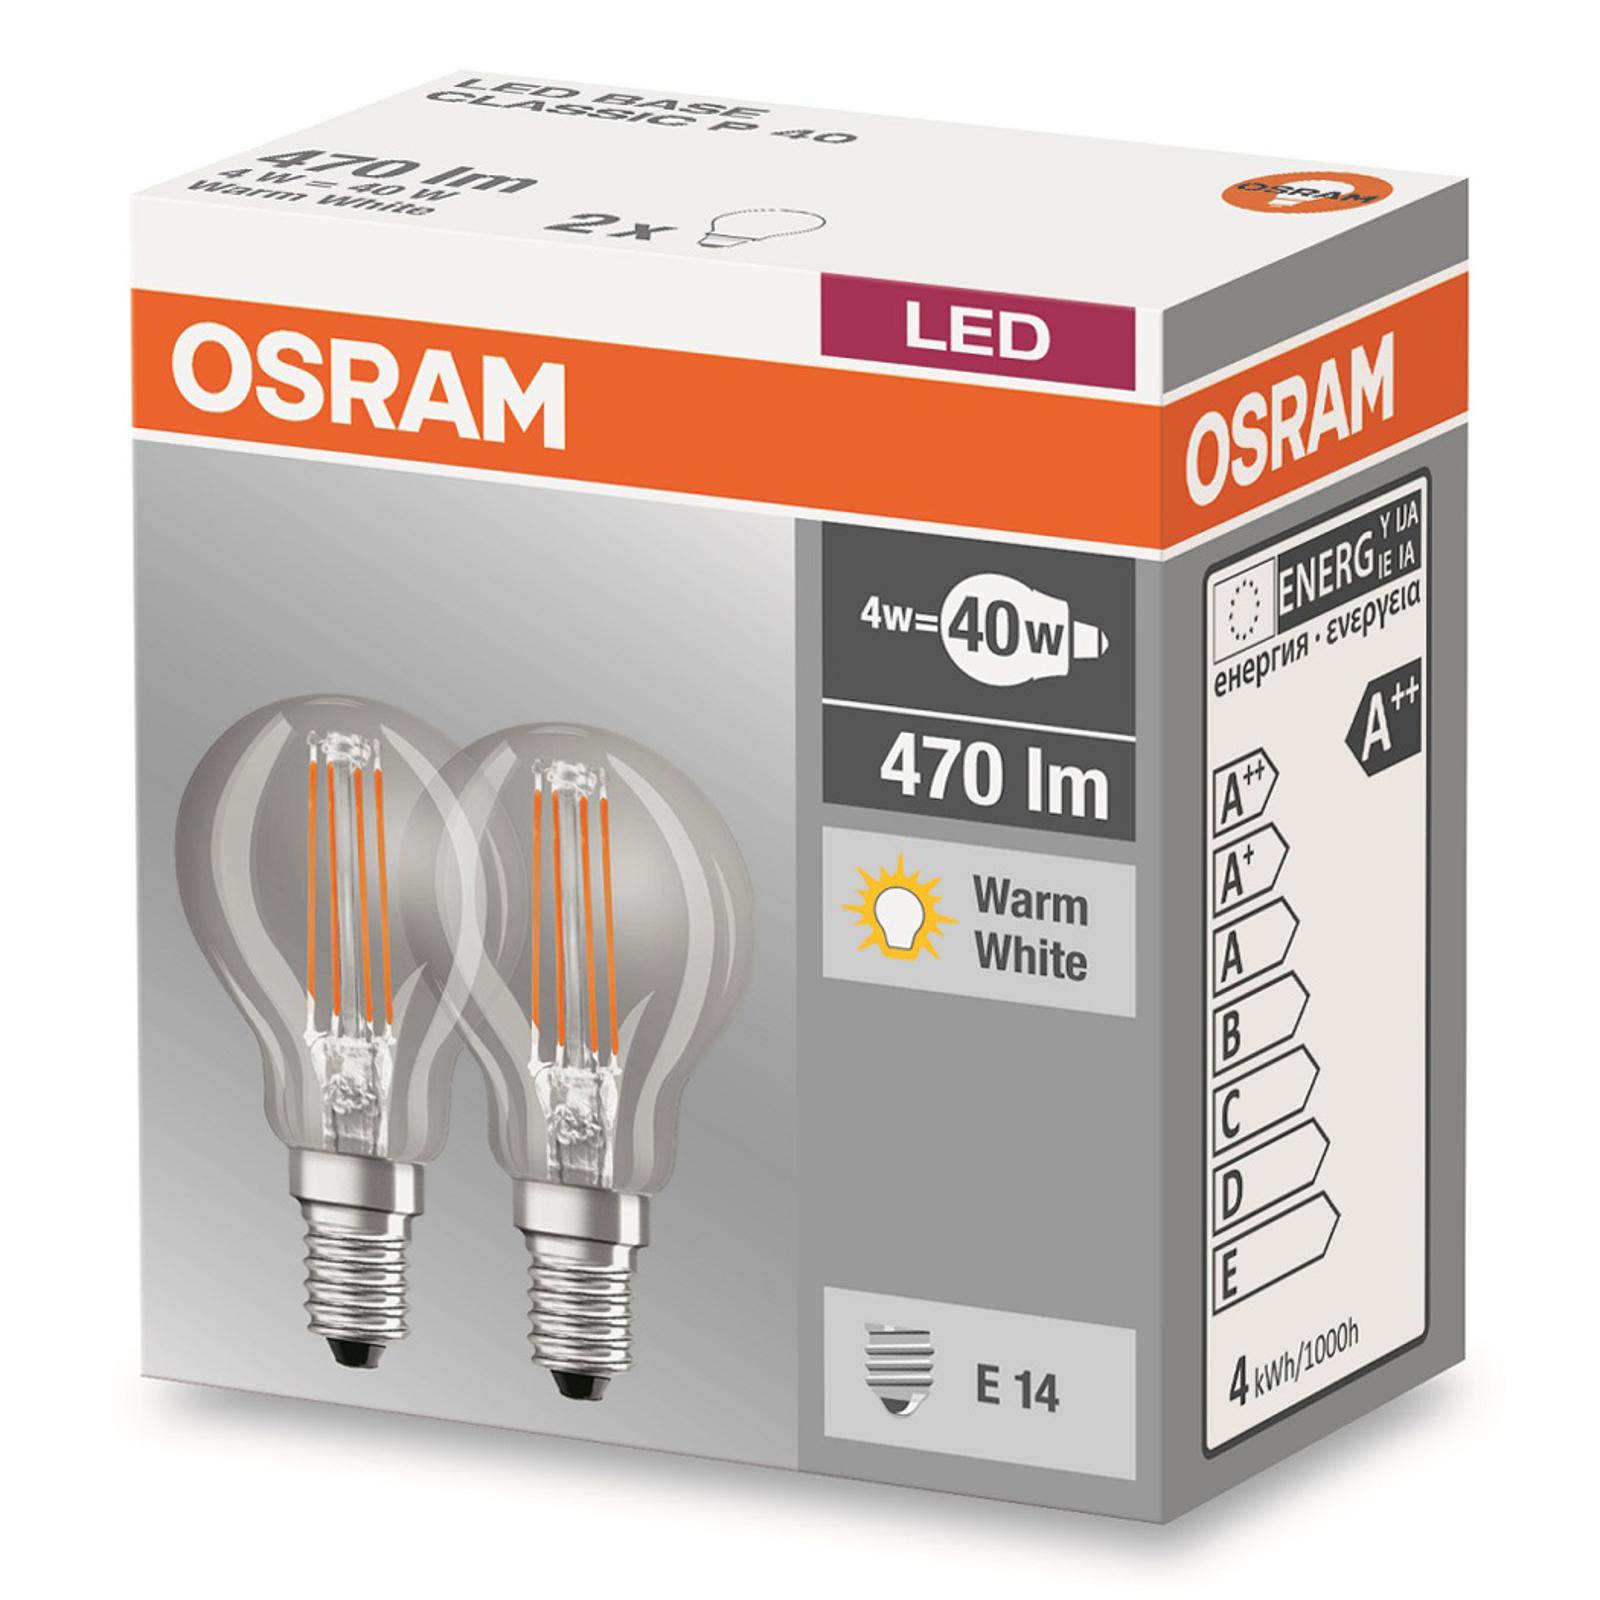 E14 4W 827 LED-pisaralamppu 2 kpl:n setti